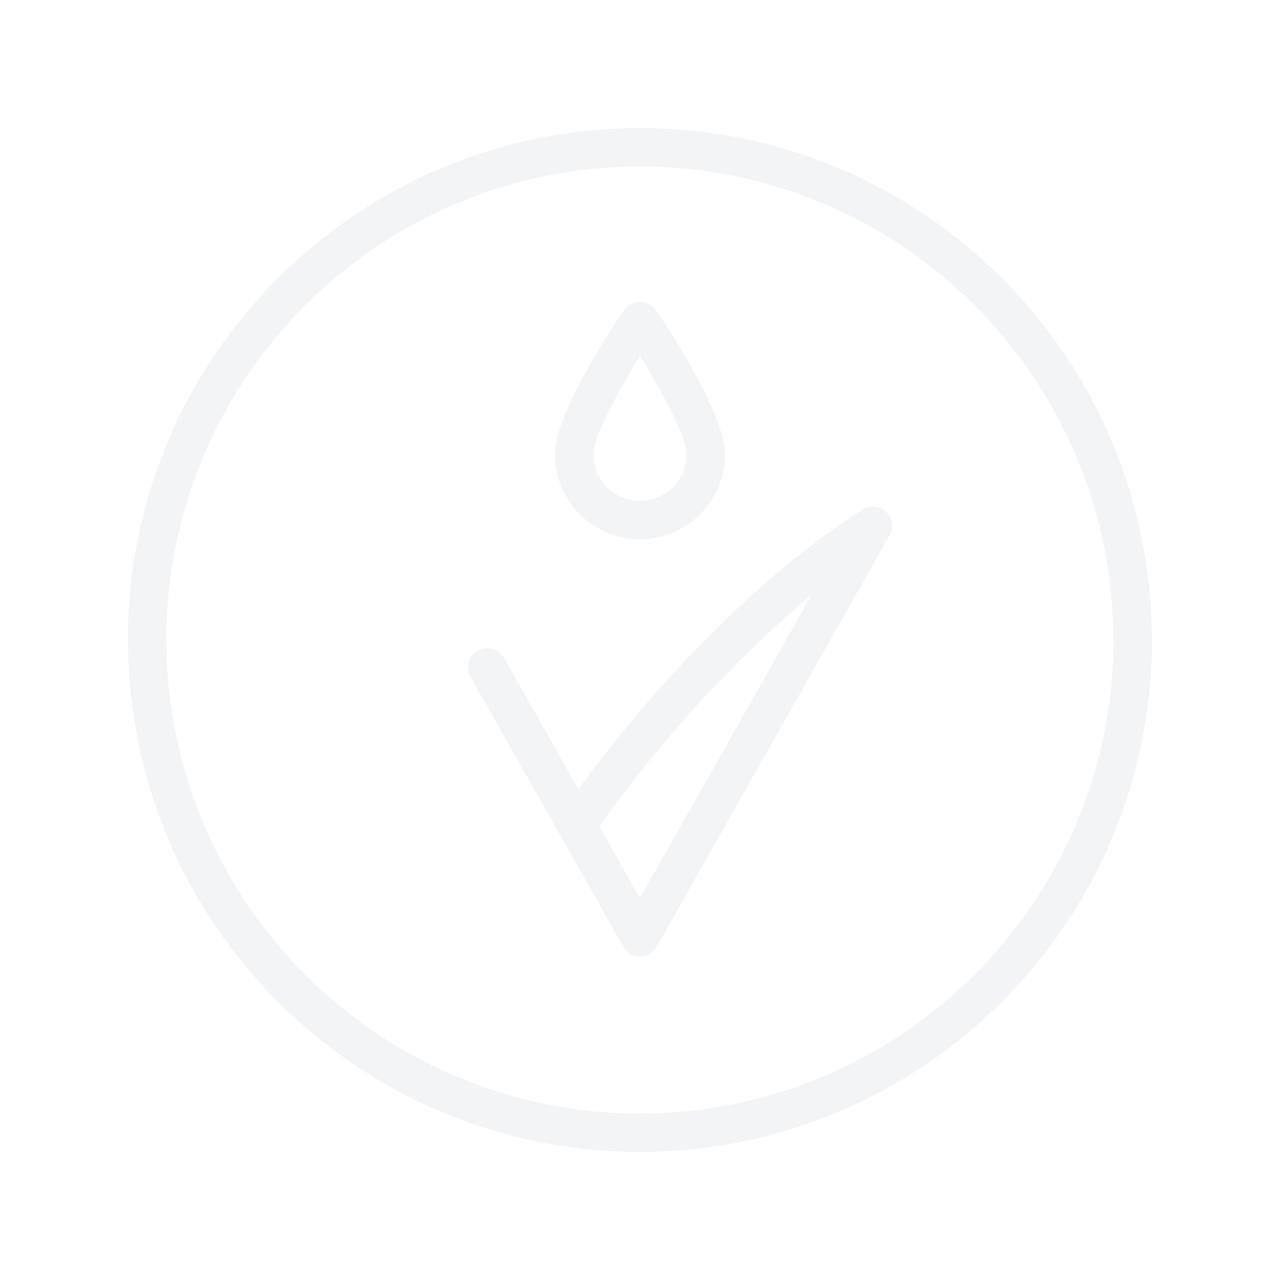 Everyday Minerals Brush Blender Face